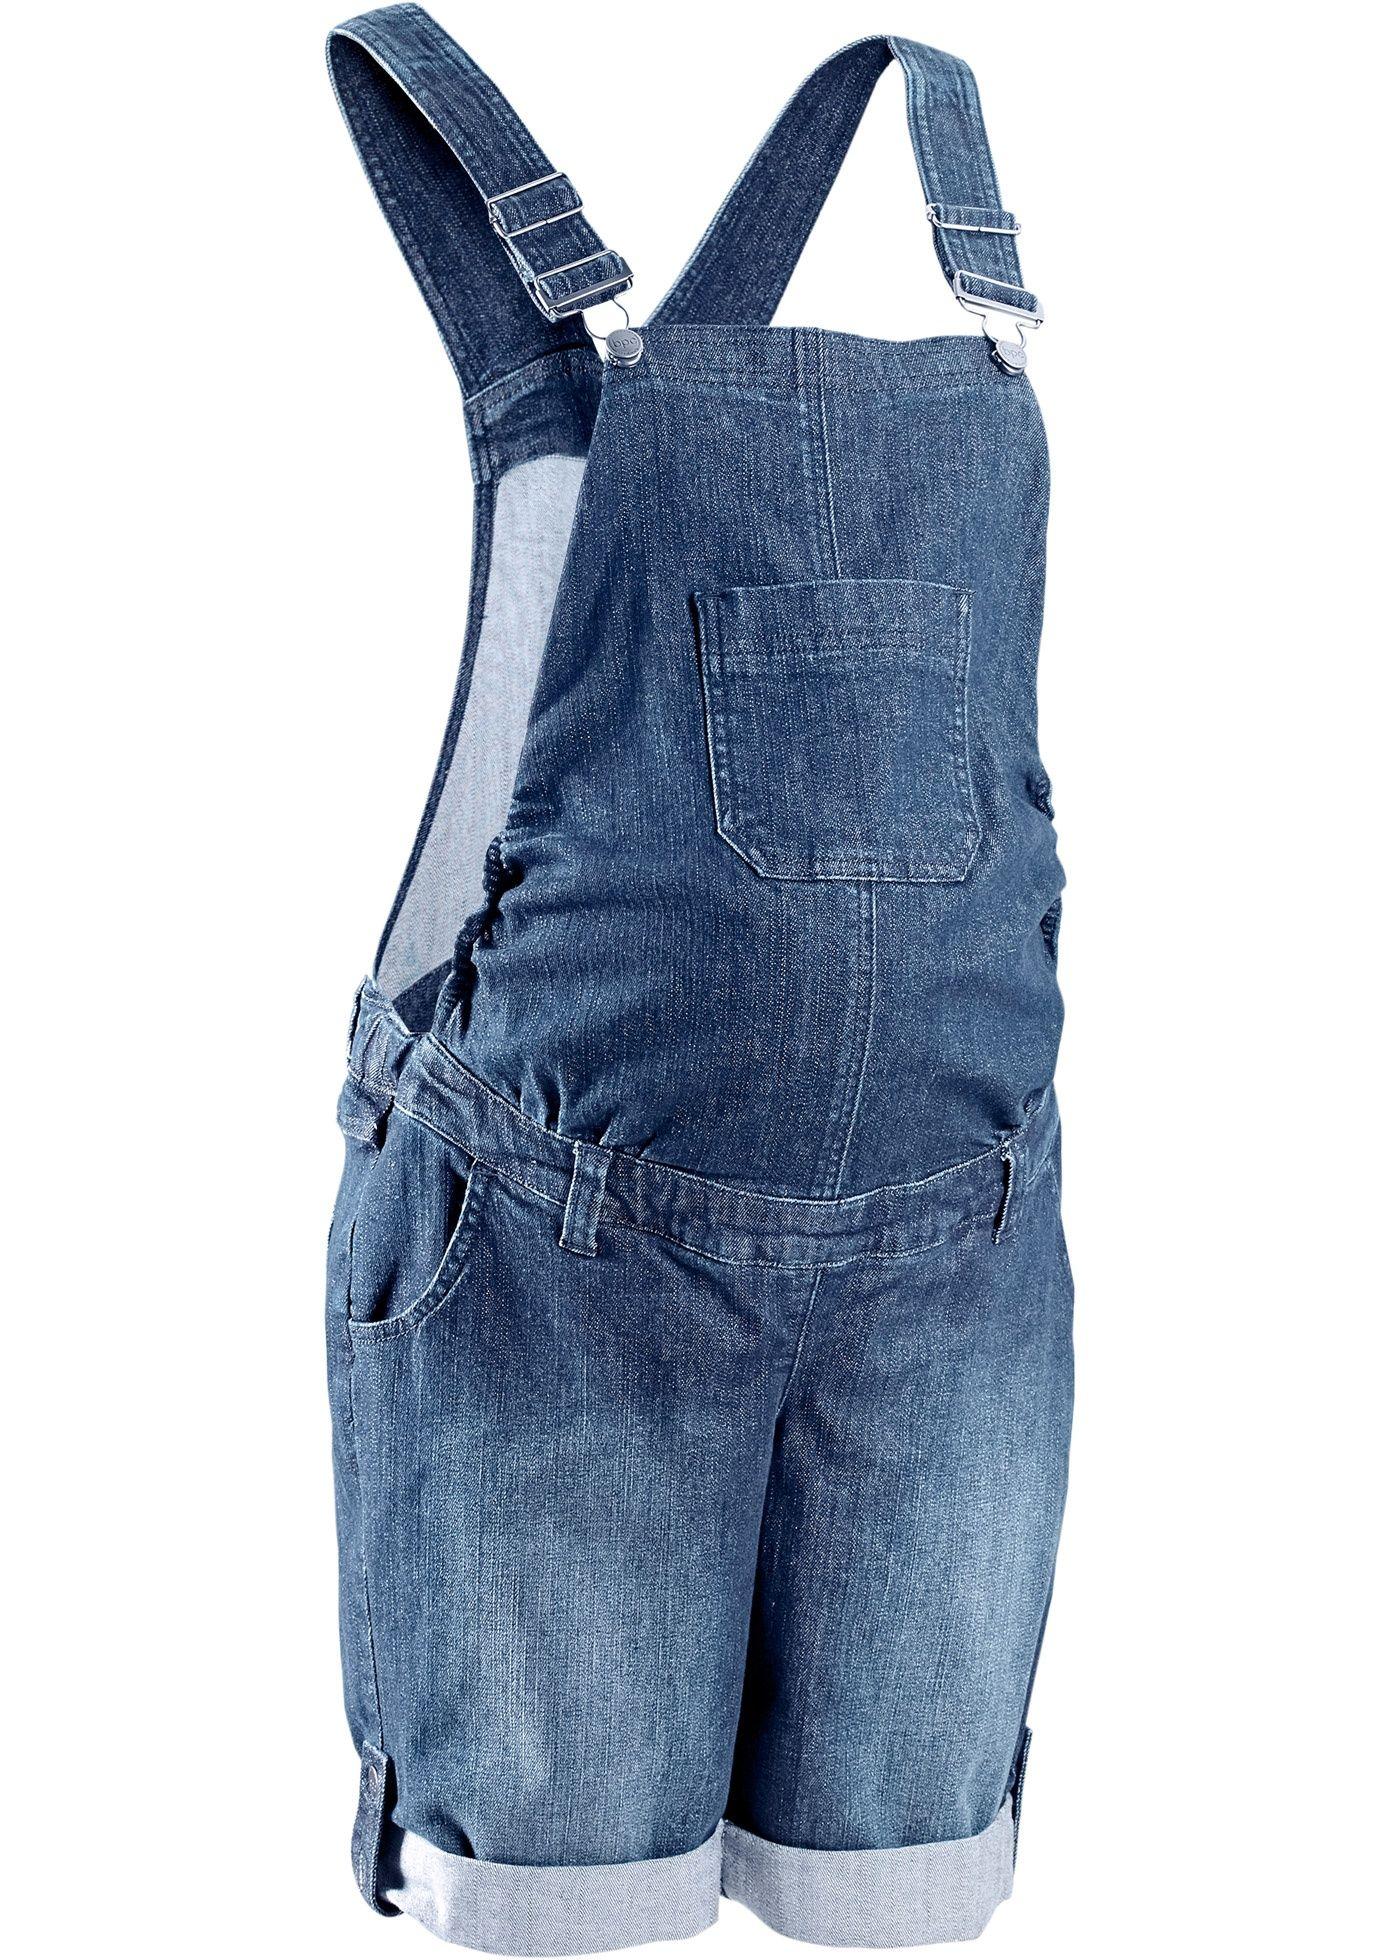 Salopette-short en jean de grossesse - Bon Prix -